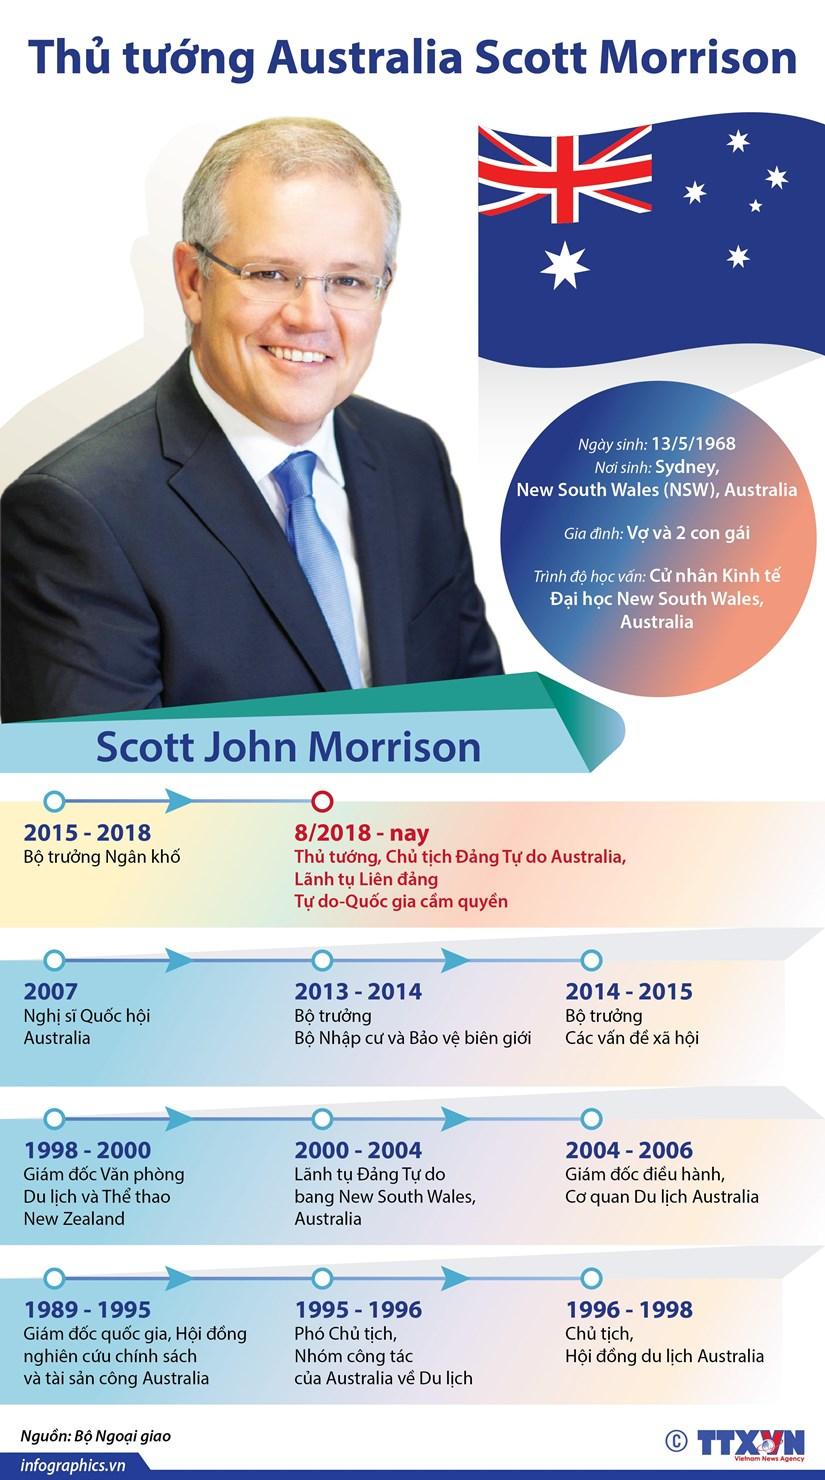 [Infographics] Thong tin co ban ve Thu tuong Australia Scott Morrison hinh anh 1